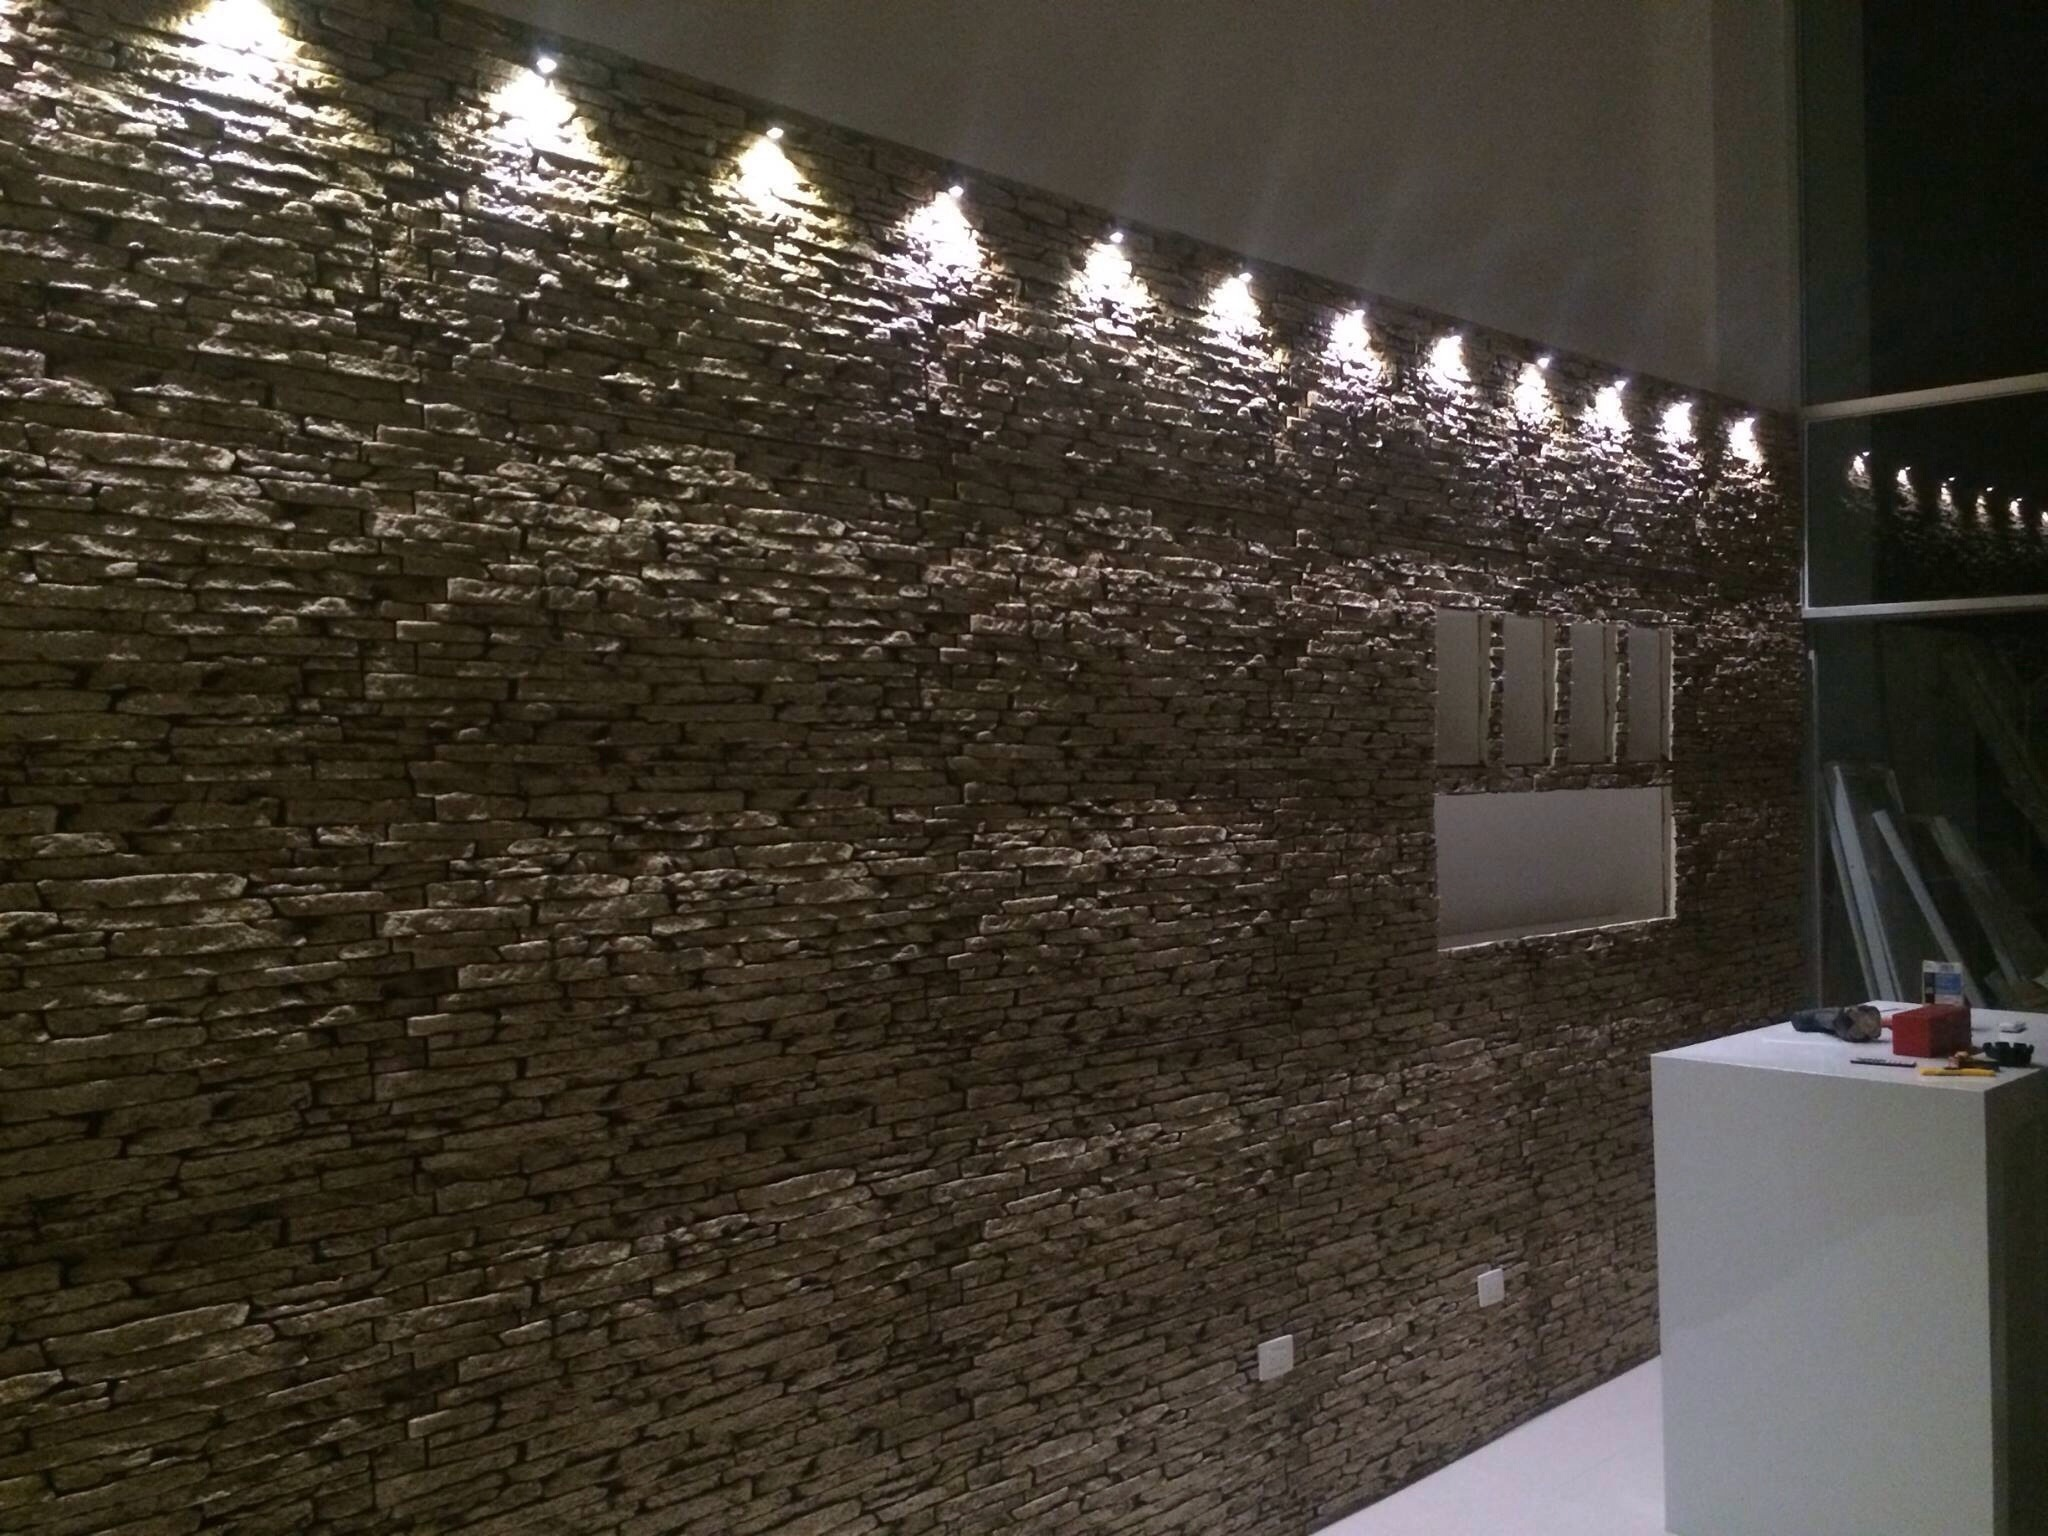 Abril 2014 elcesarmolduras 39 s blog - Muros decorativos para interiores ...